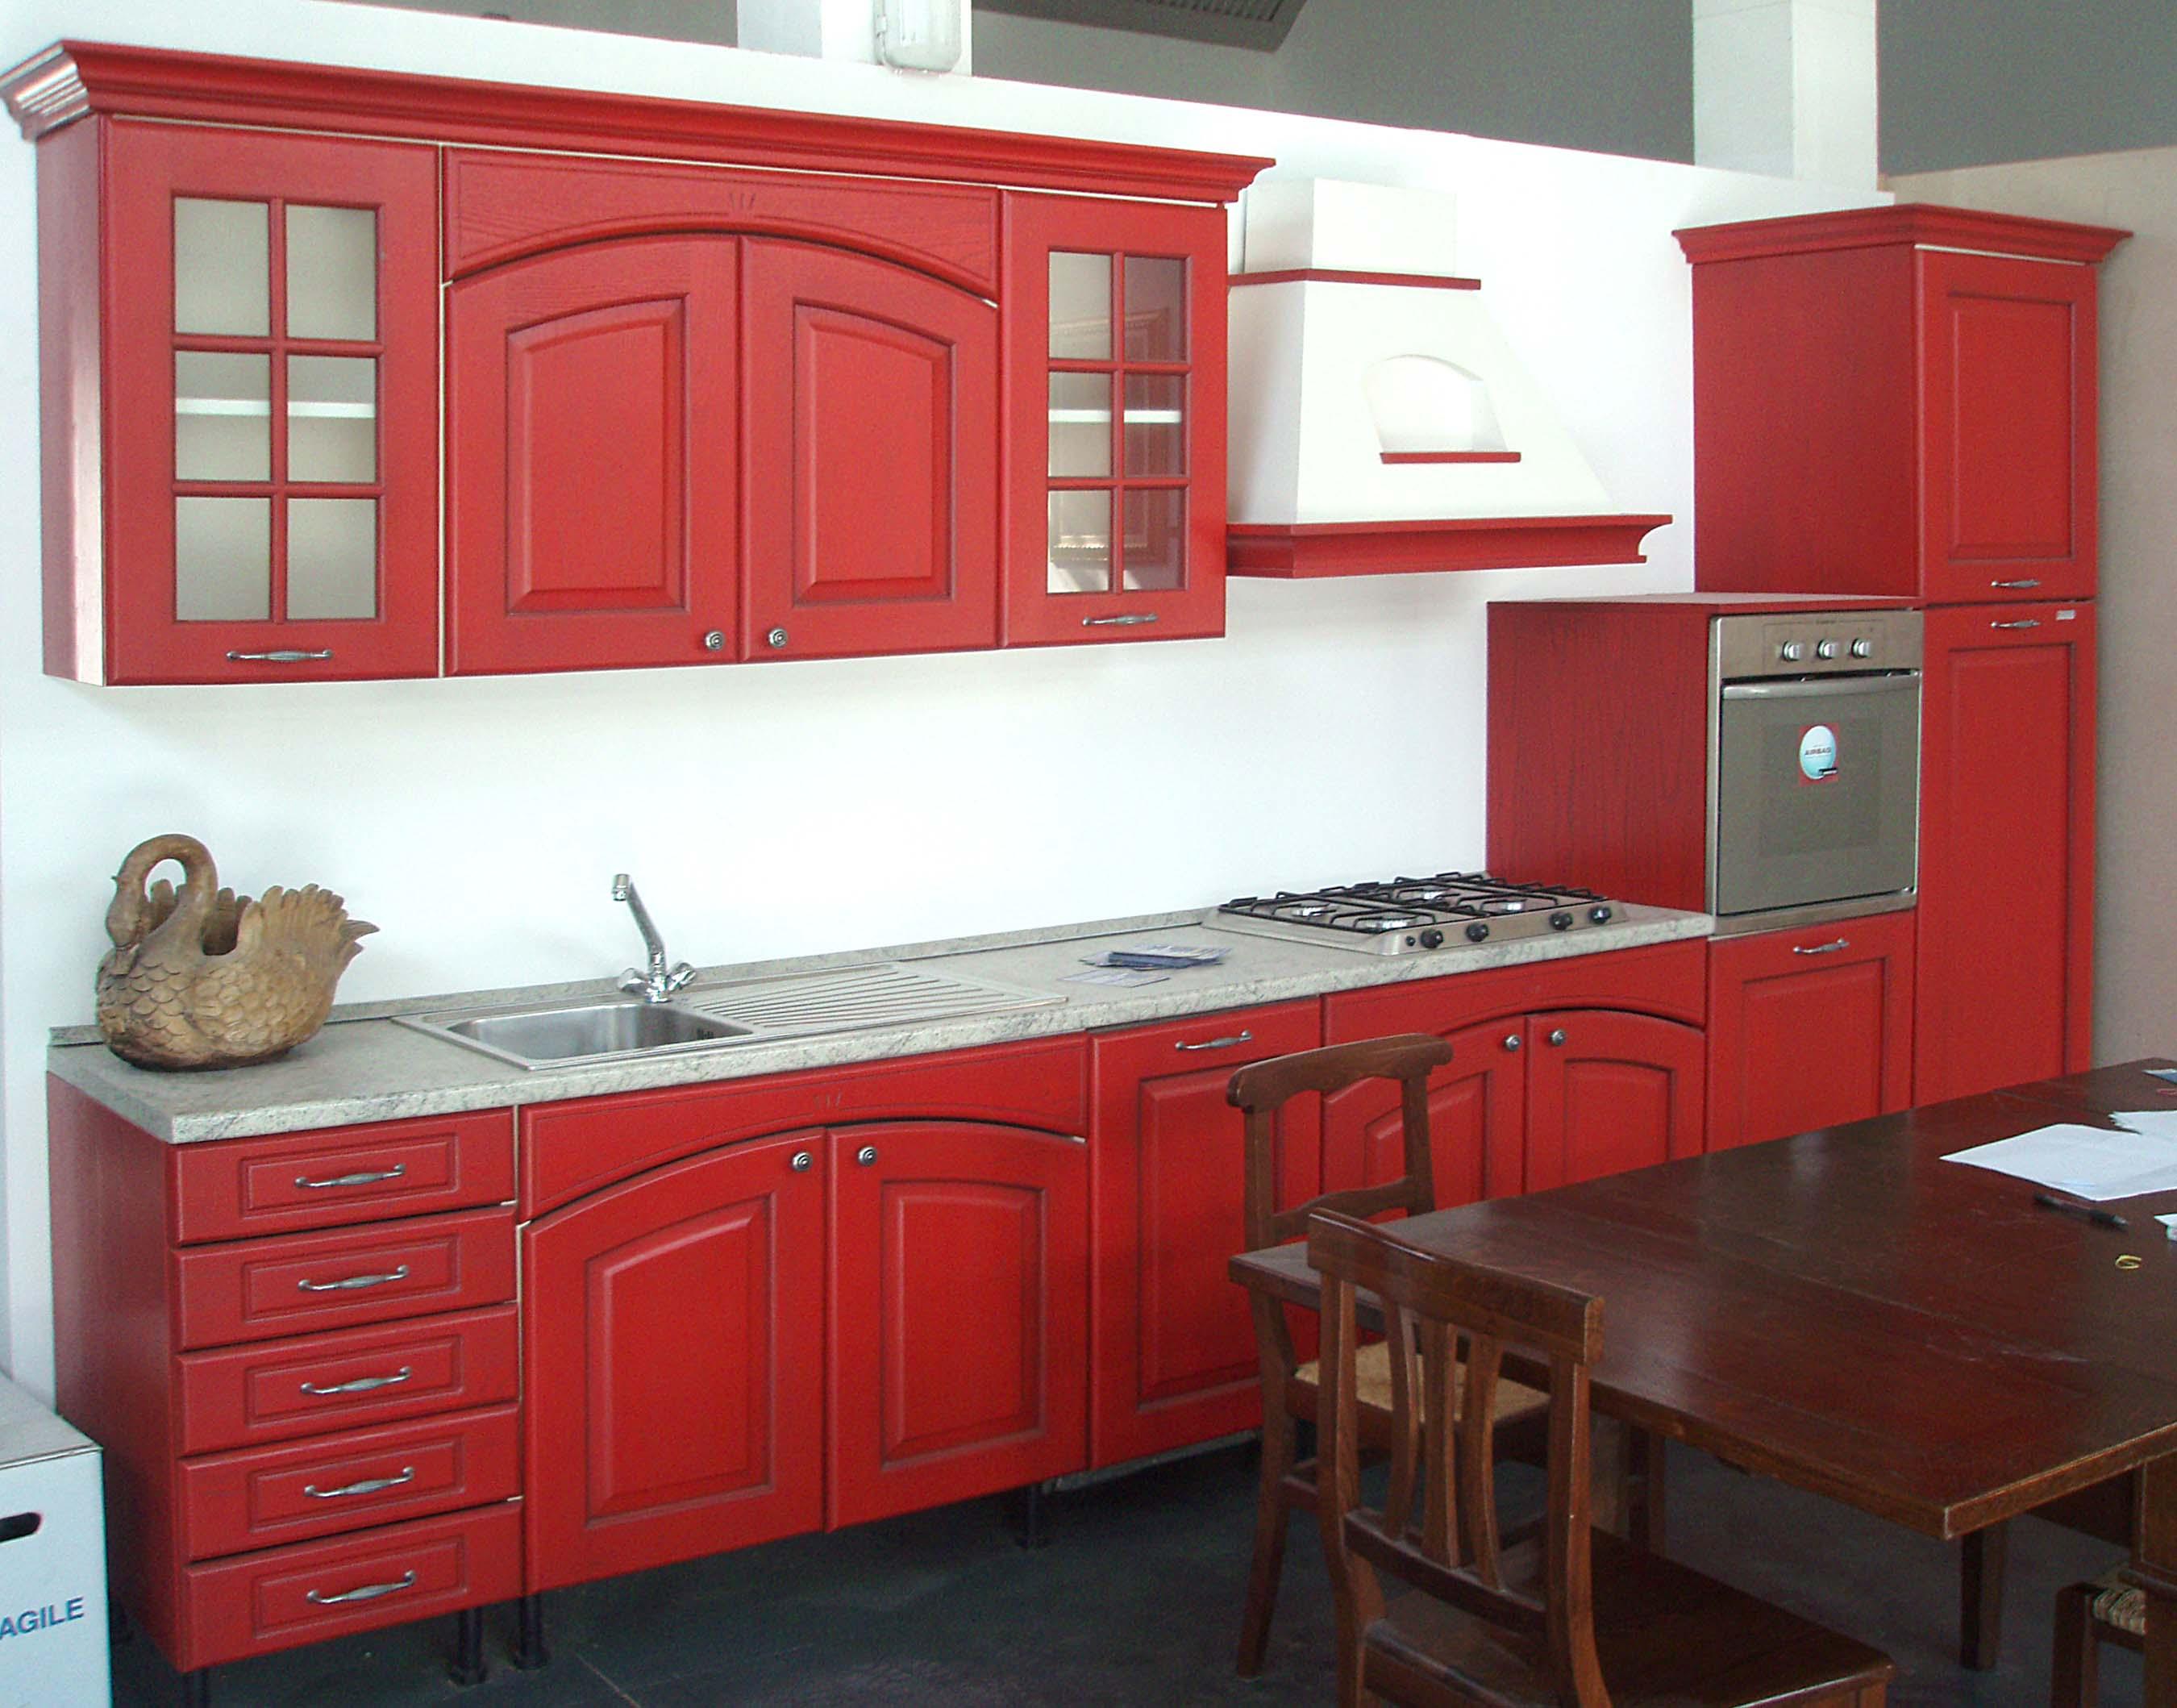 Cucine Angolari Offerte : Cucine ad angolo offerte. Cucine ...